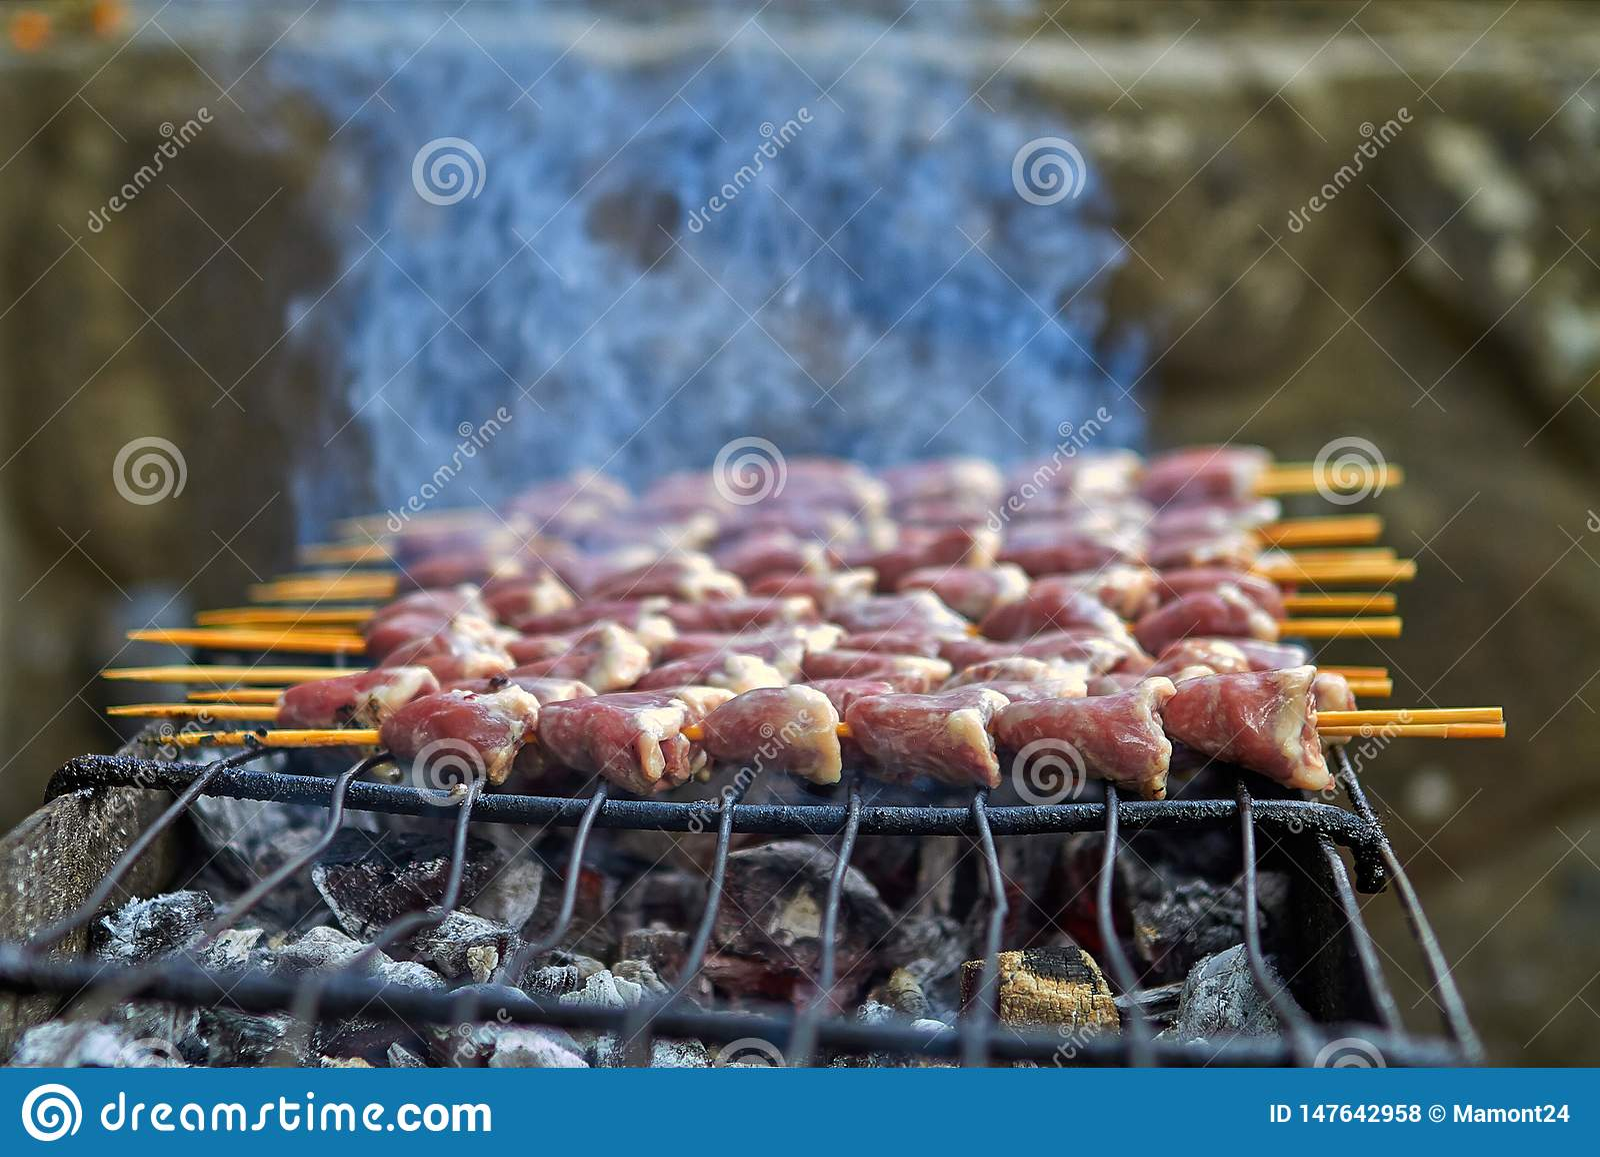 Poulet grill? un ressort chaud